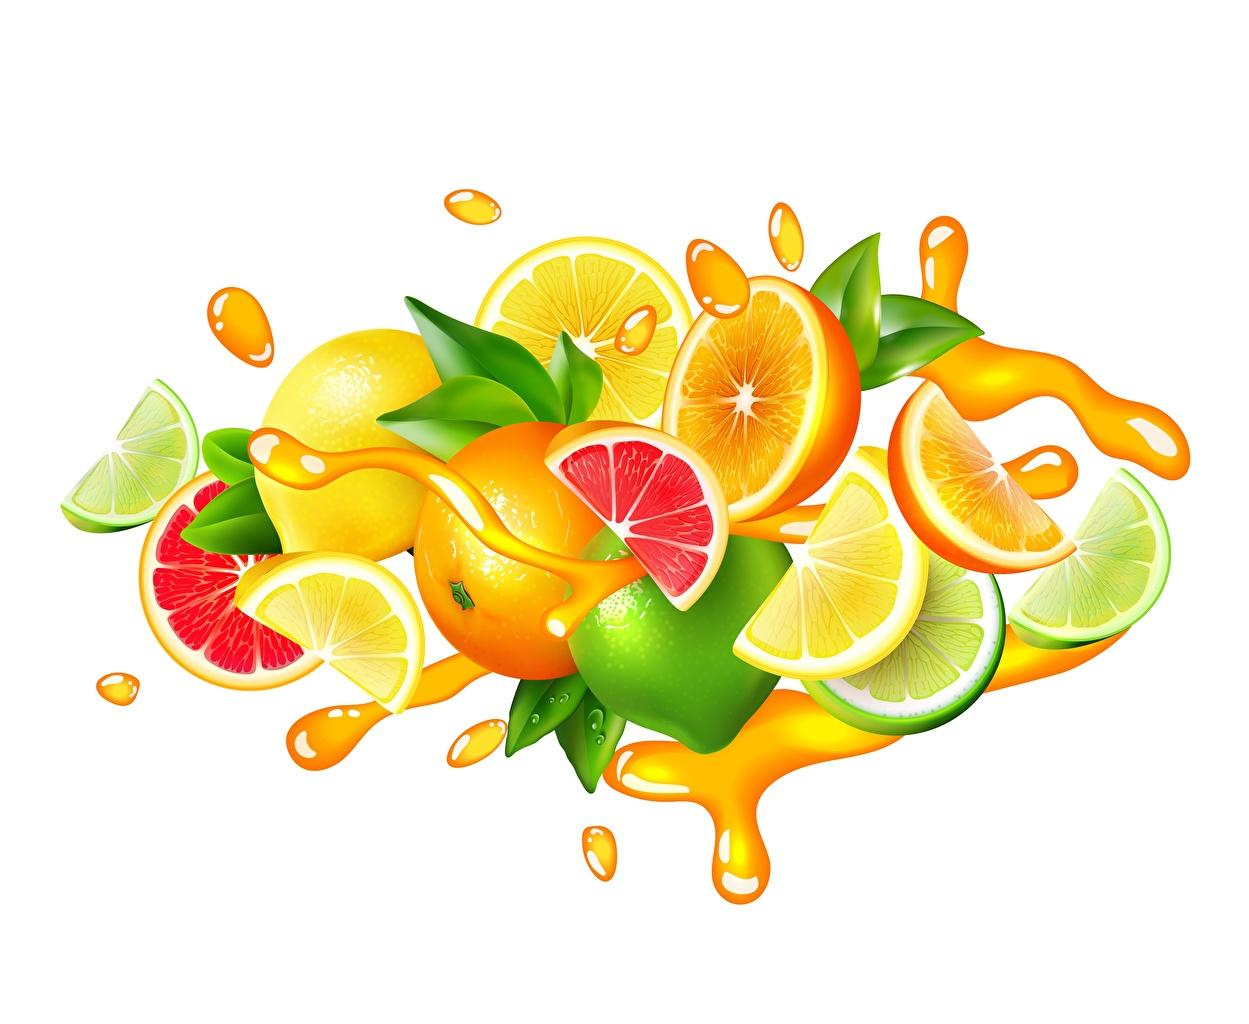 Picture Lime Juice Grapefruit Lemons Water splash Food Citrus Vector Graphics White background